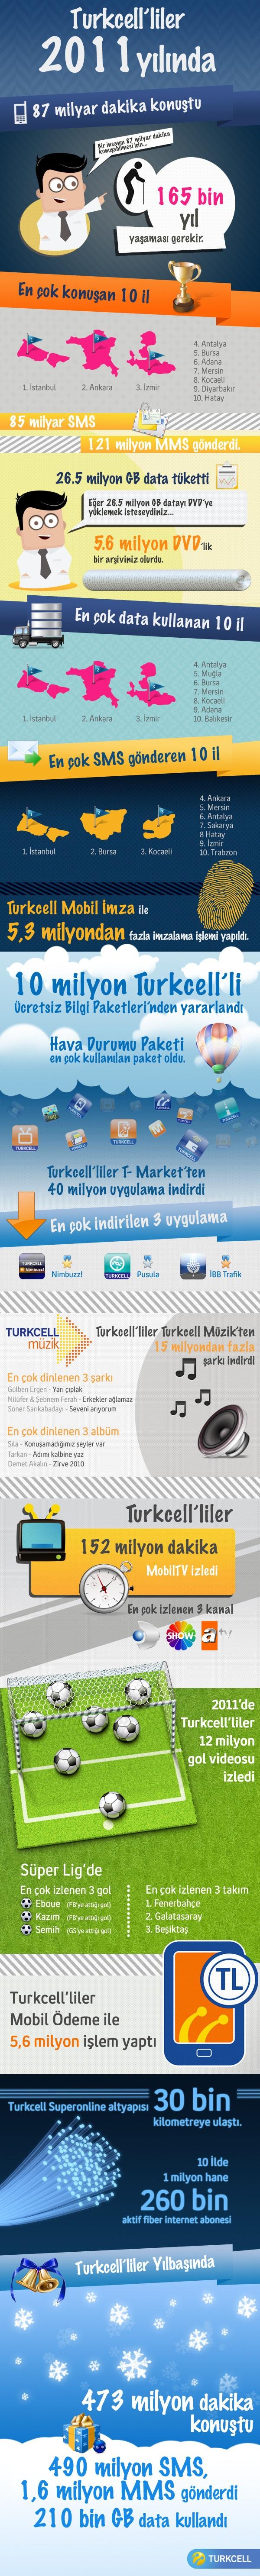 Turkcell 2011